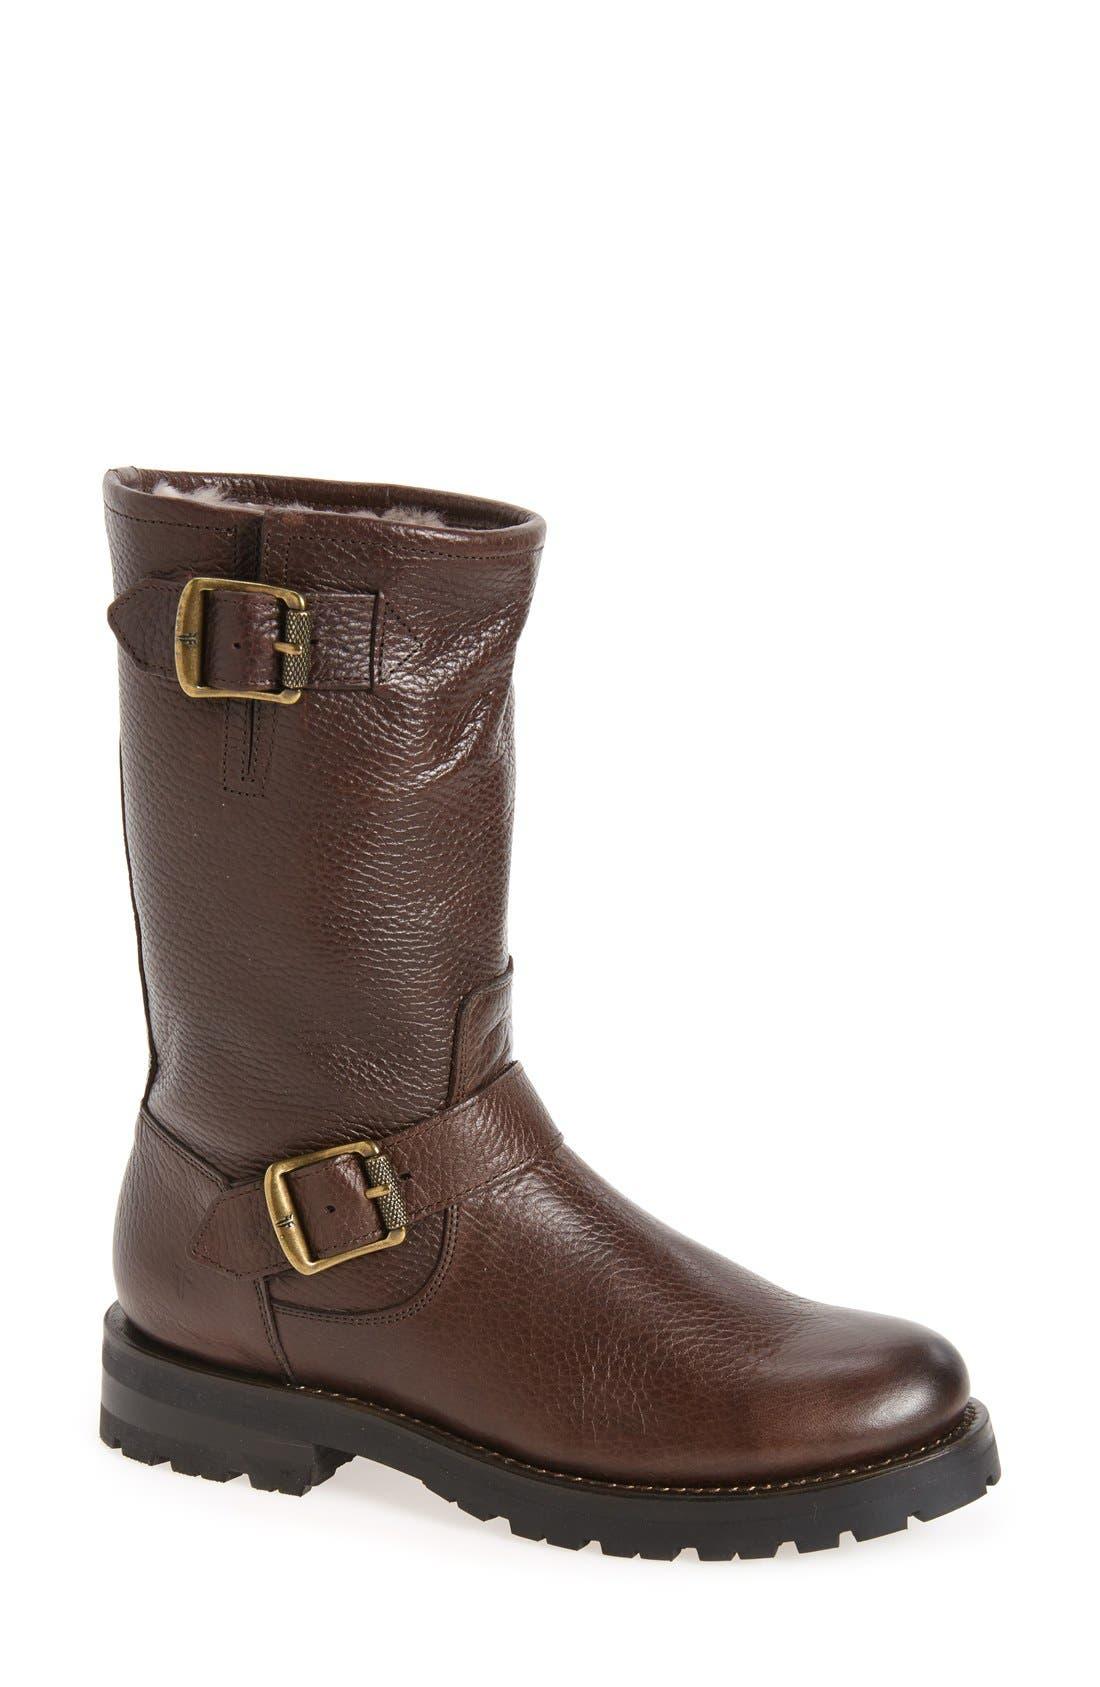 Main Image - Frye Natalie Buckle Strap Engineer Genuine Shearling Lined Boot (Women)